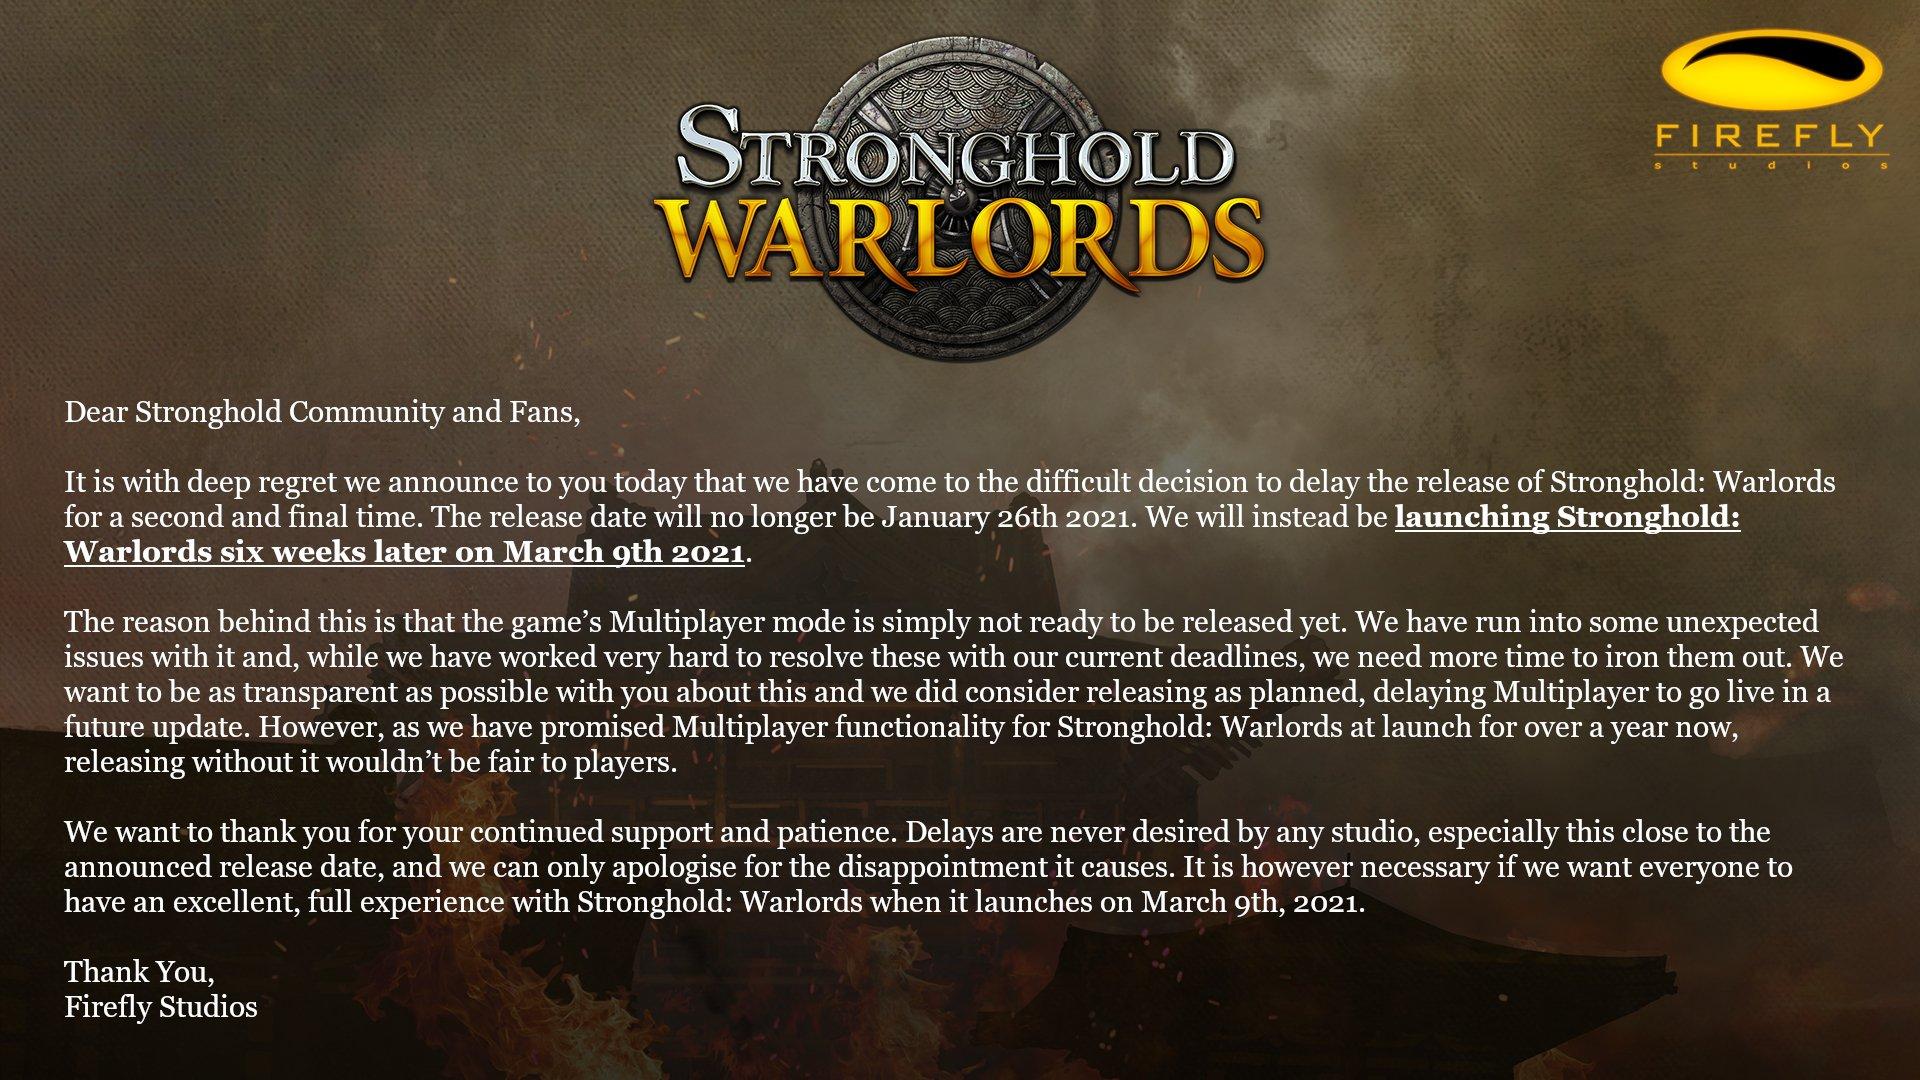 Stronghold: Warlords odložena Erdp9bkXYAIUMbg